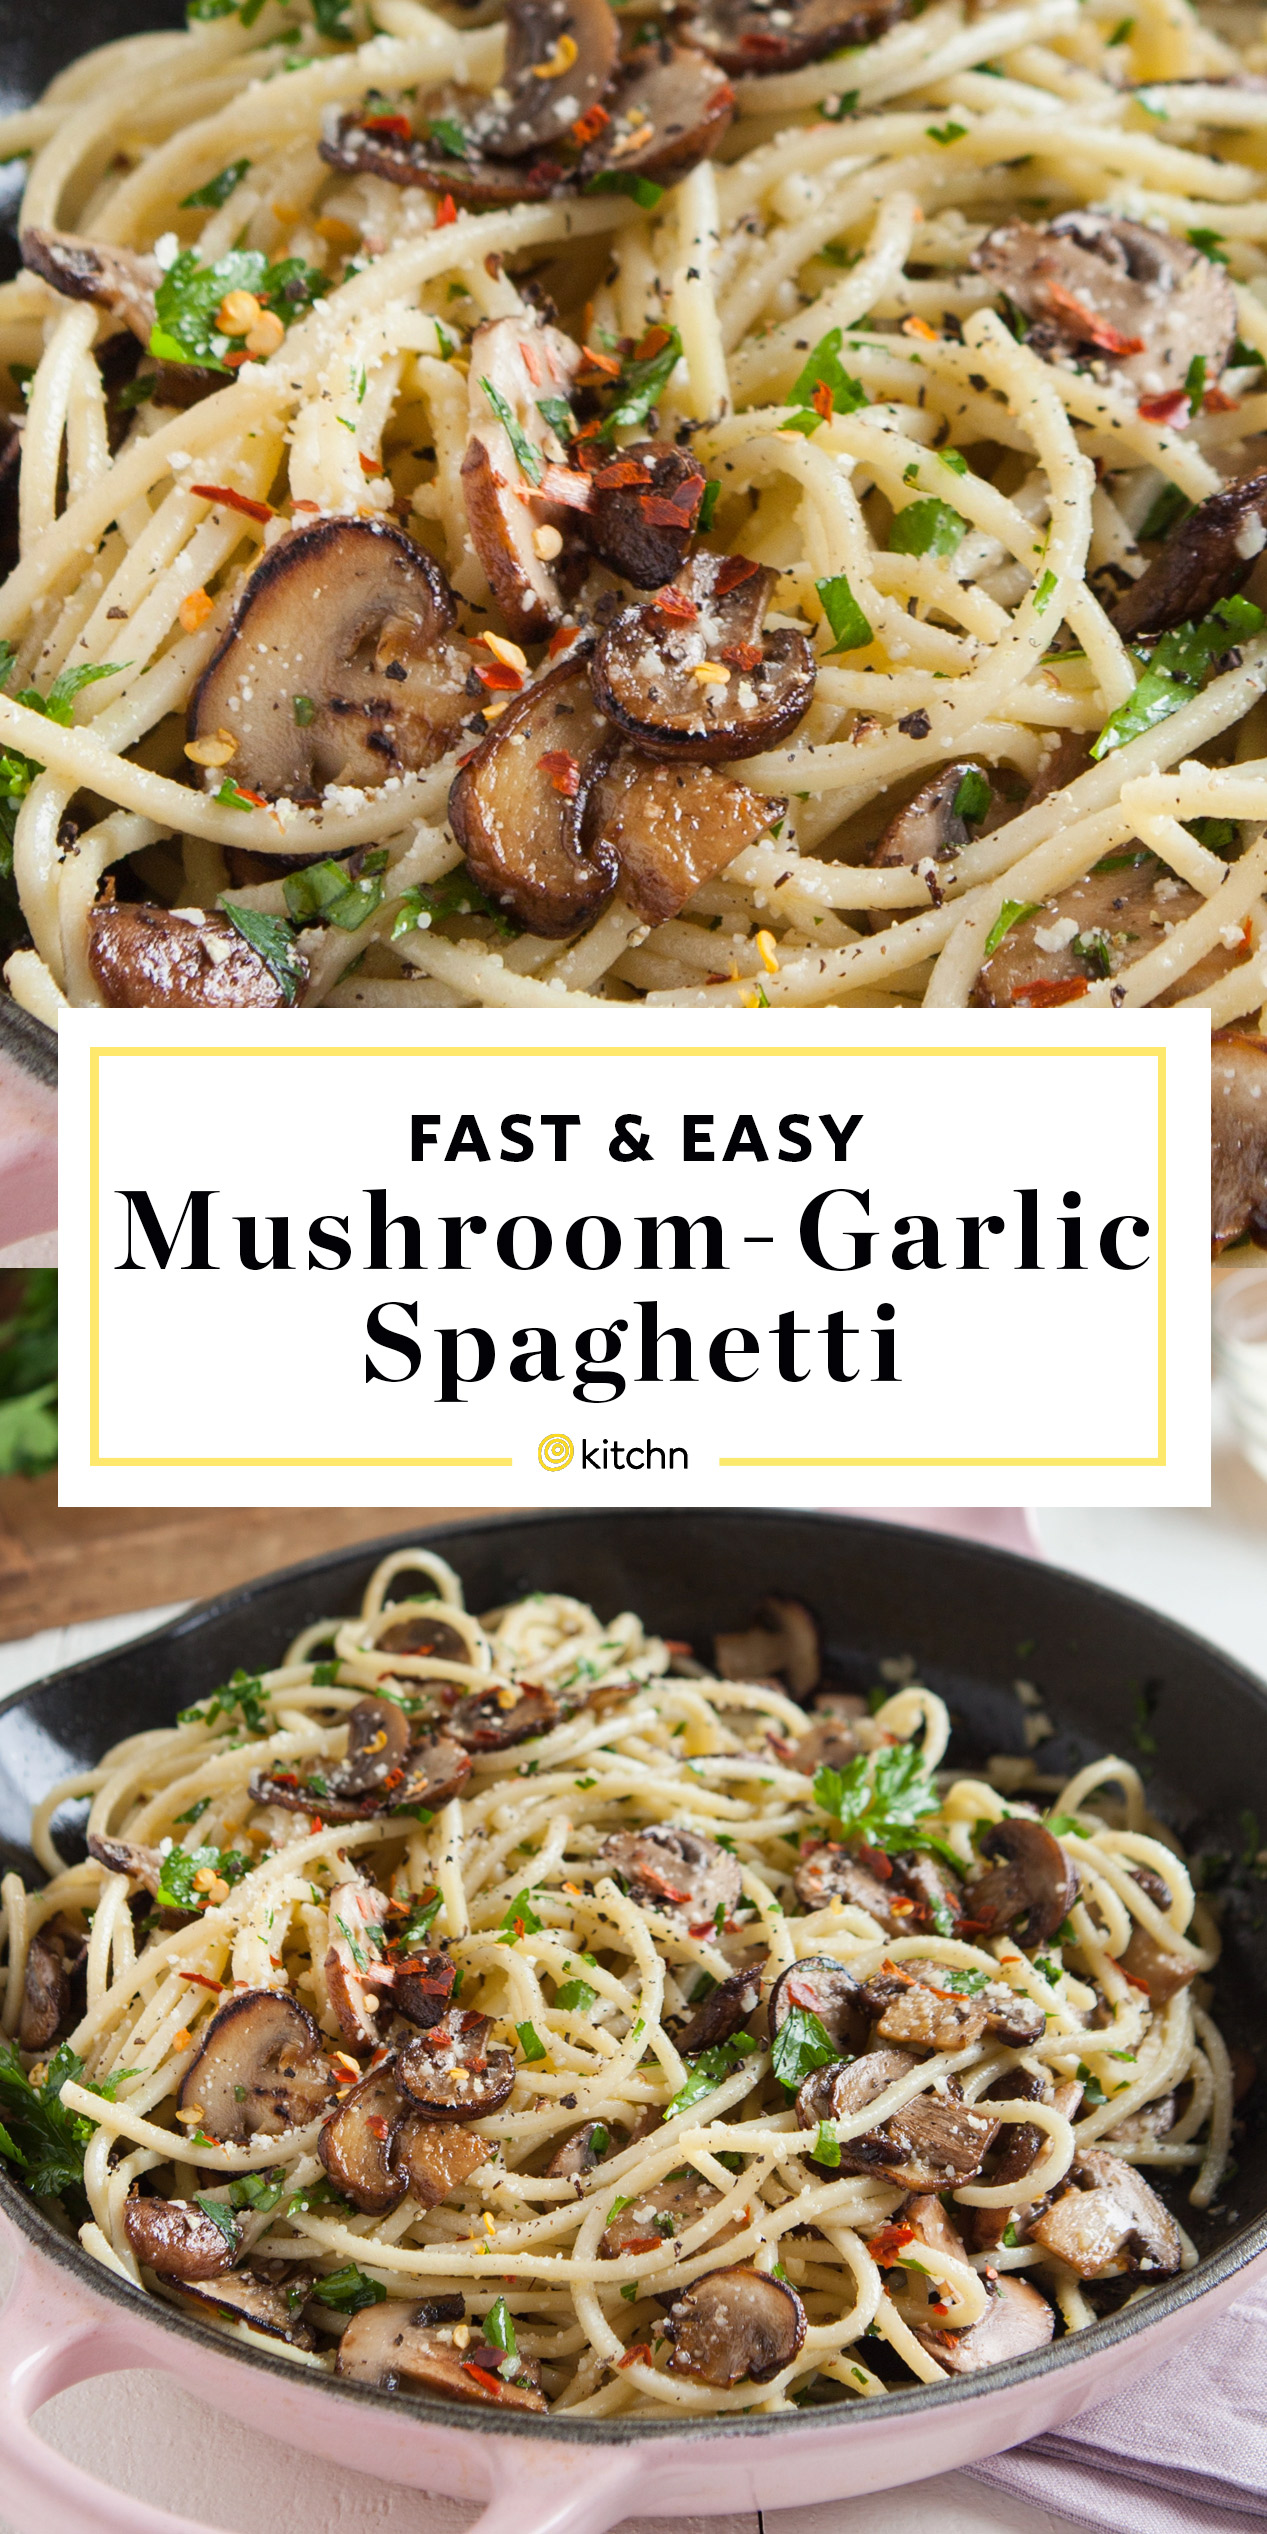 Recipe Easy Mushroom And Garlic Spaghetti Kitchn